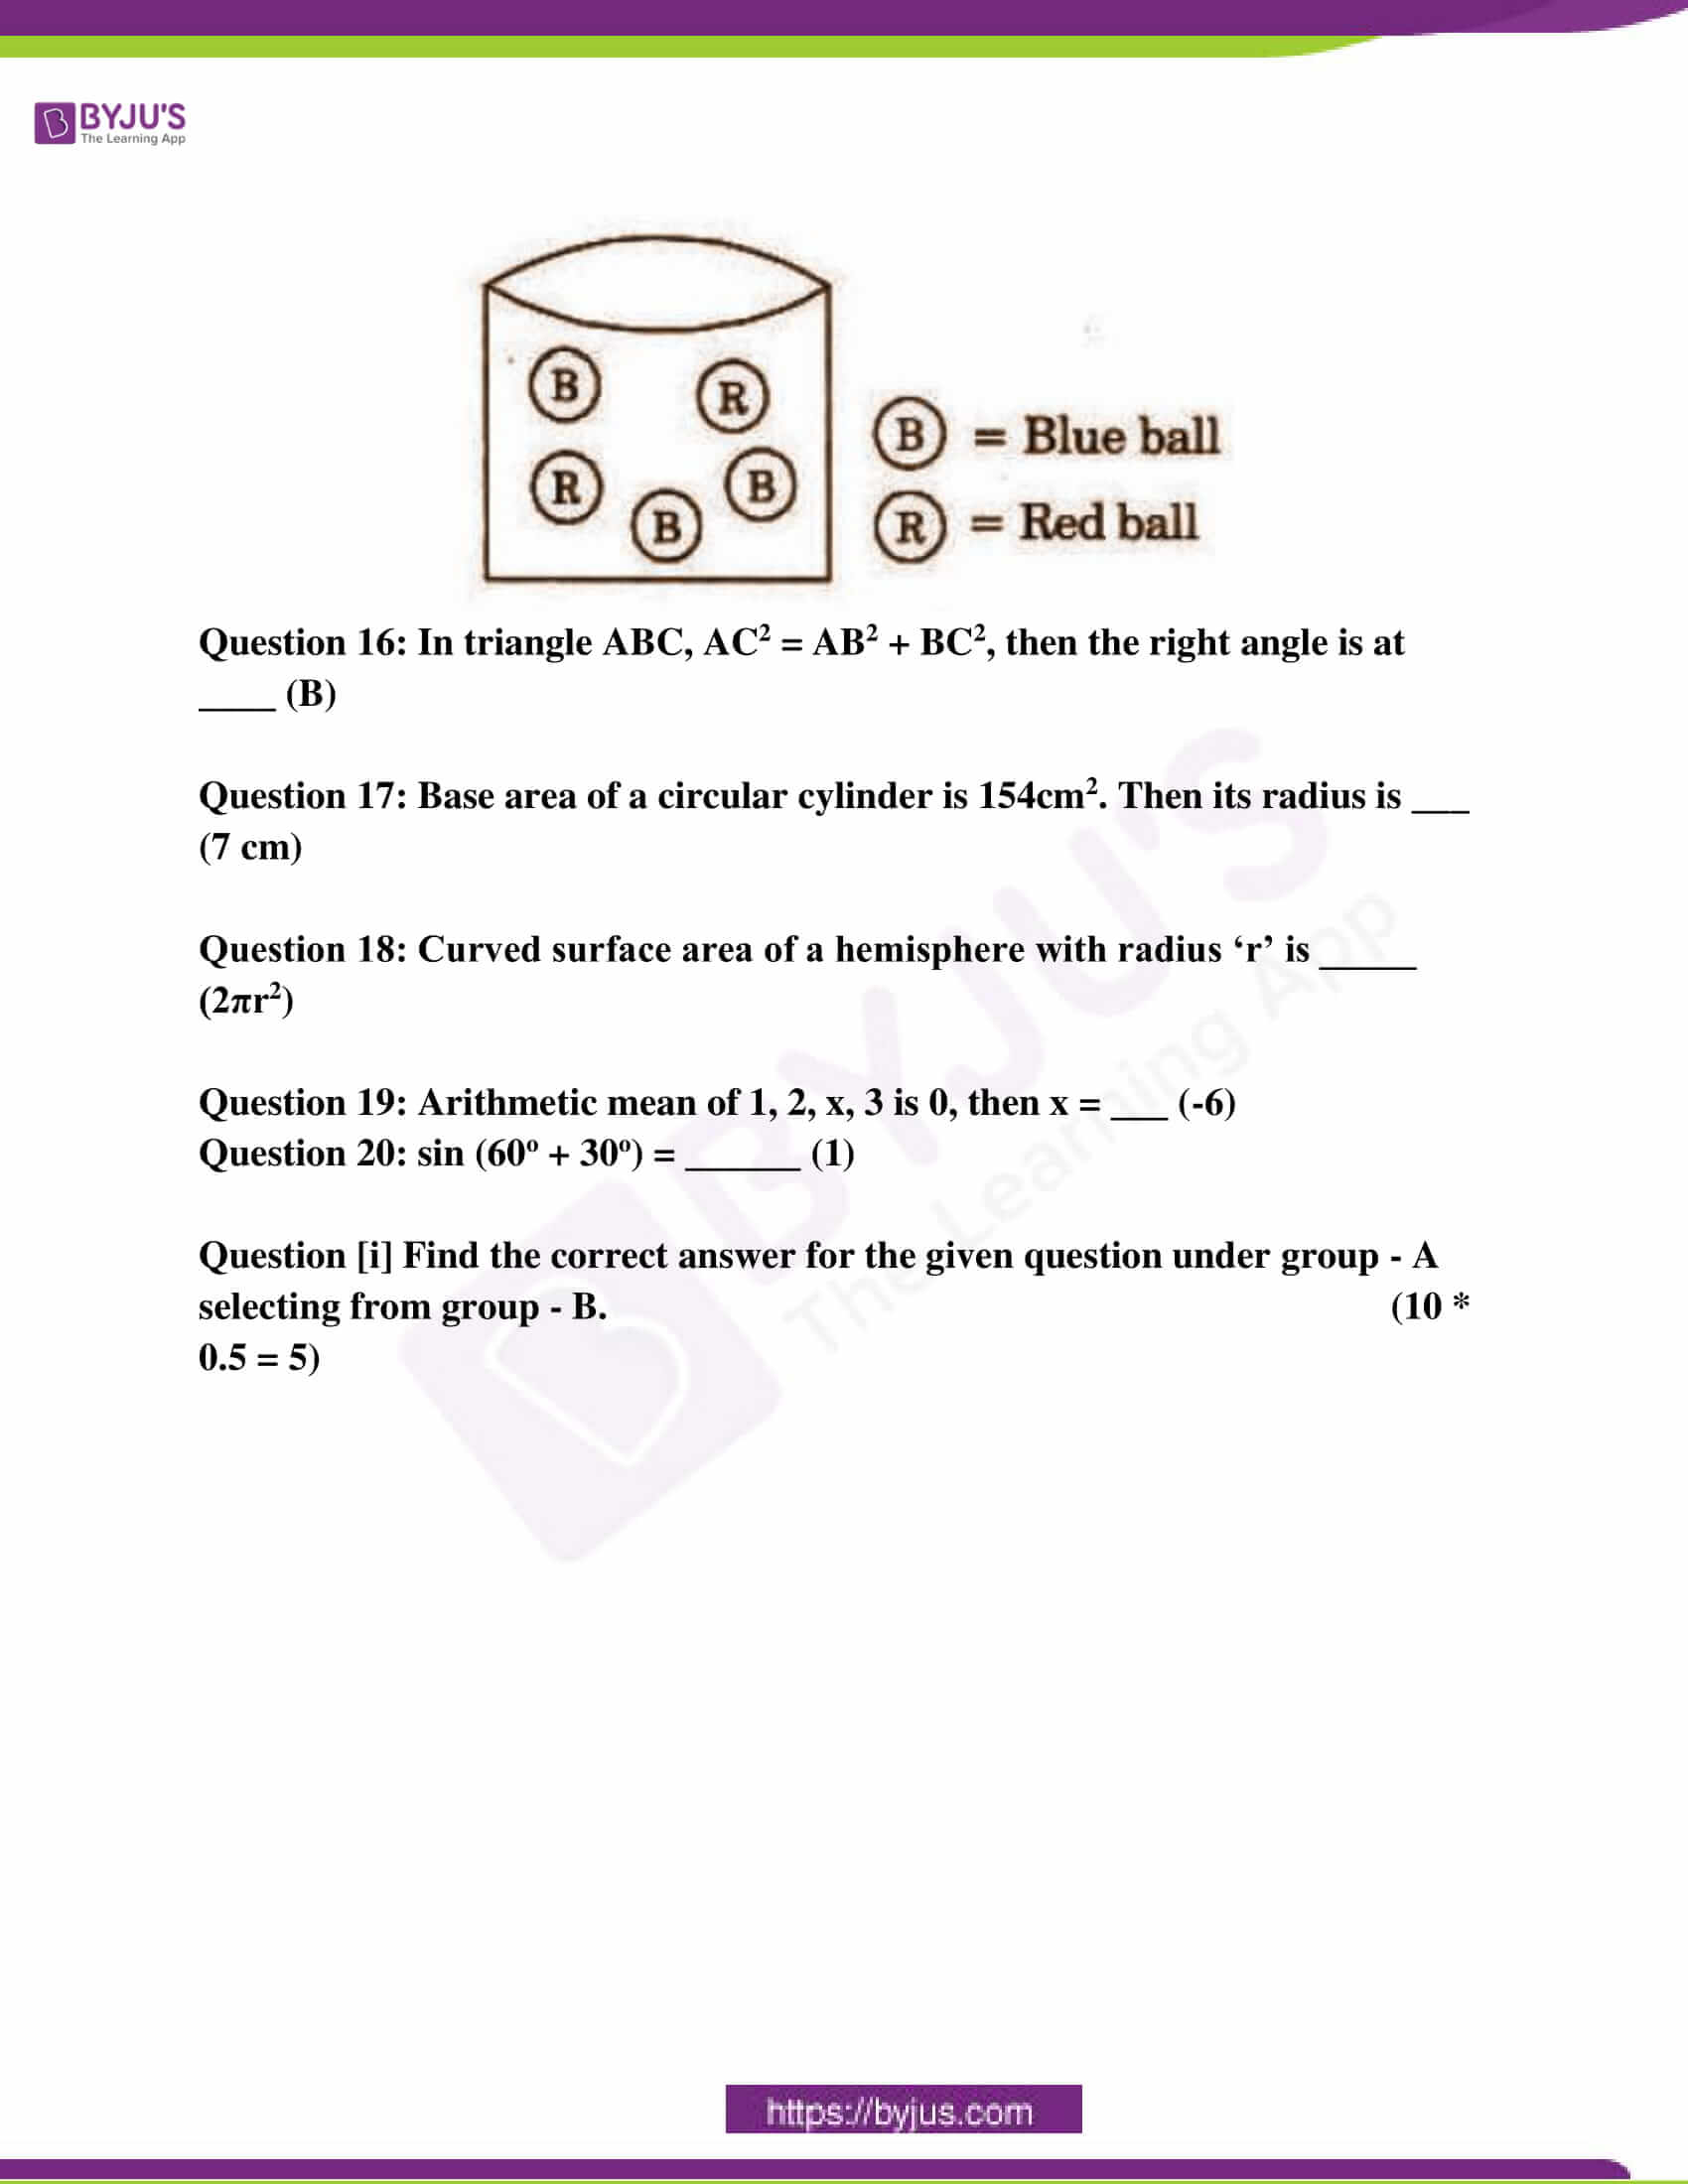 ap class 10 maths question paper 2 sol march 2016 18